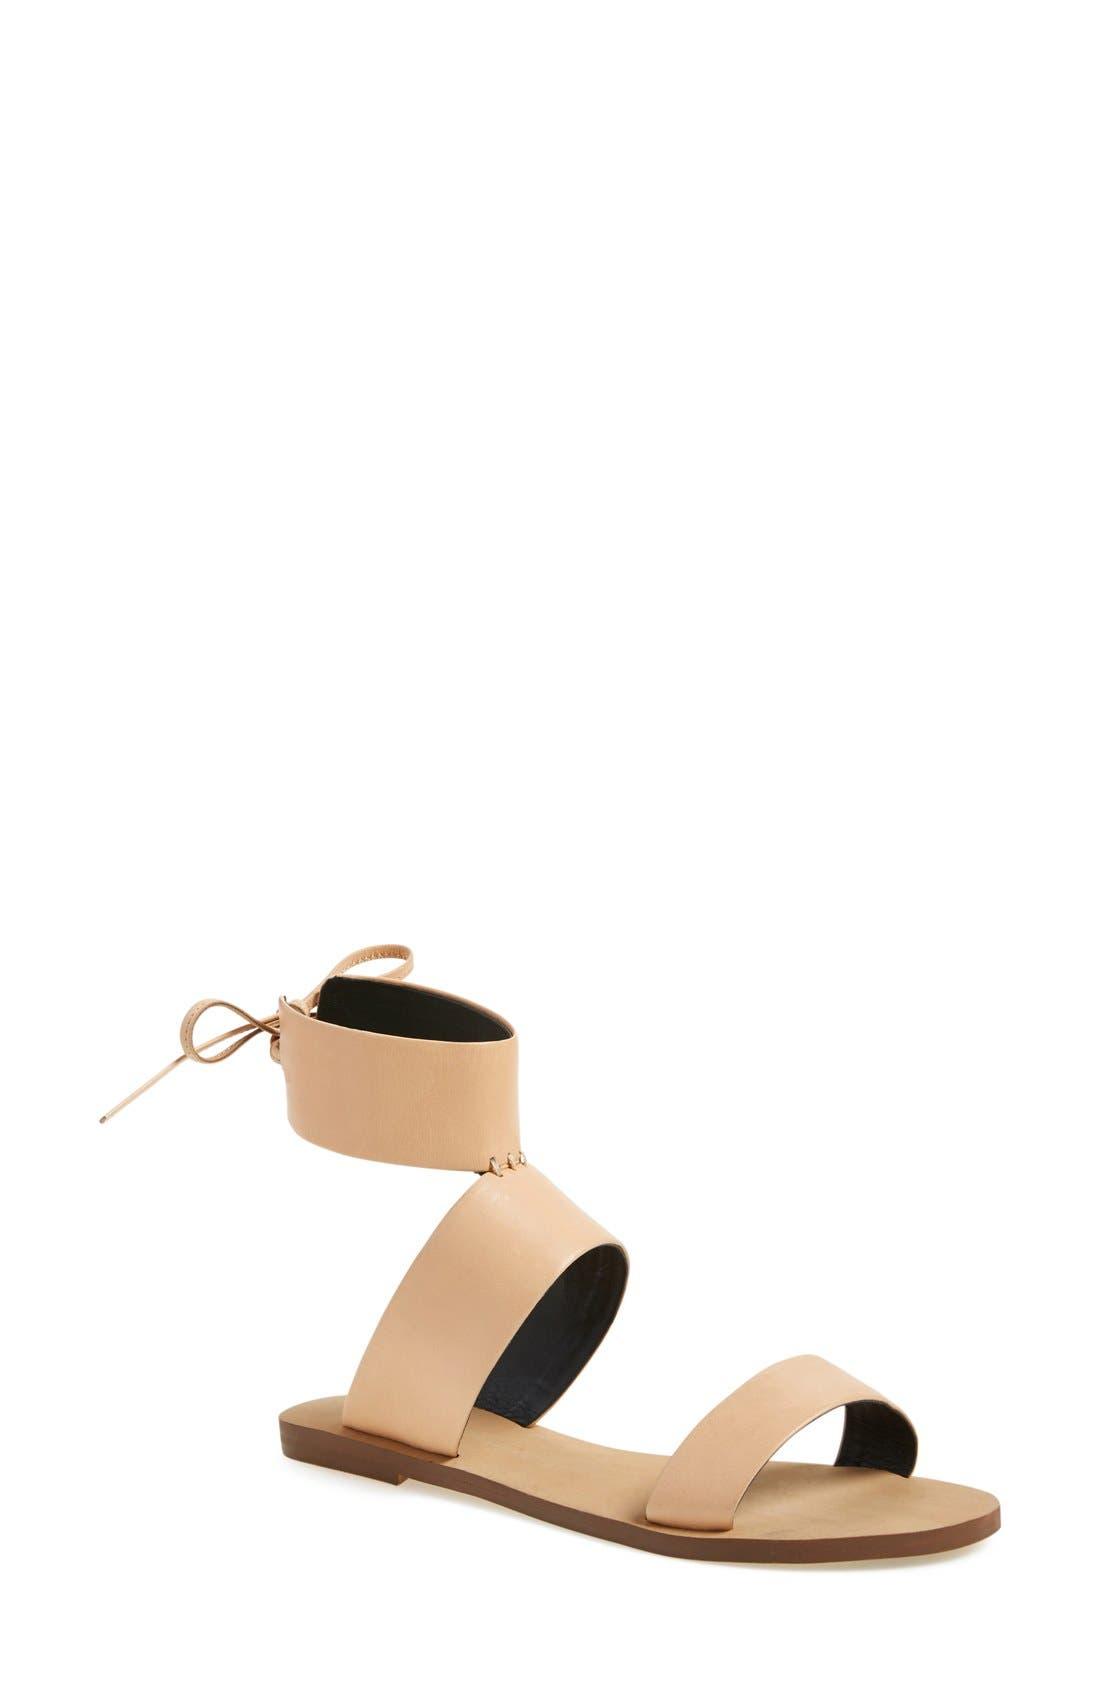 Main Image - Rebecca Minkoff 'Emma' Ankle Cuff Sandal (Women)